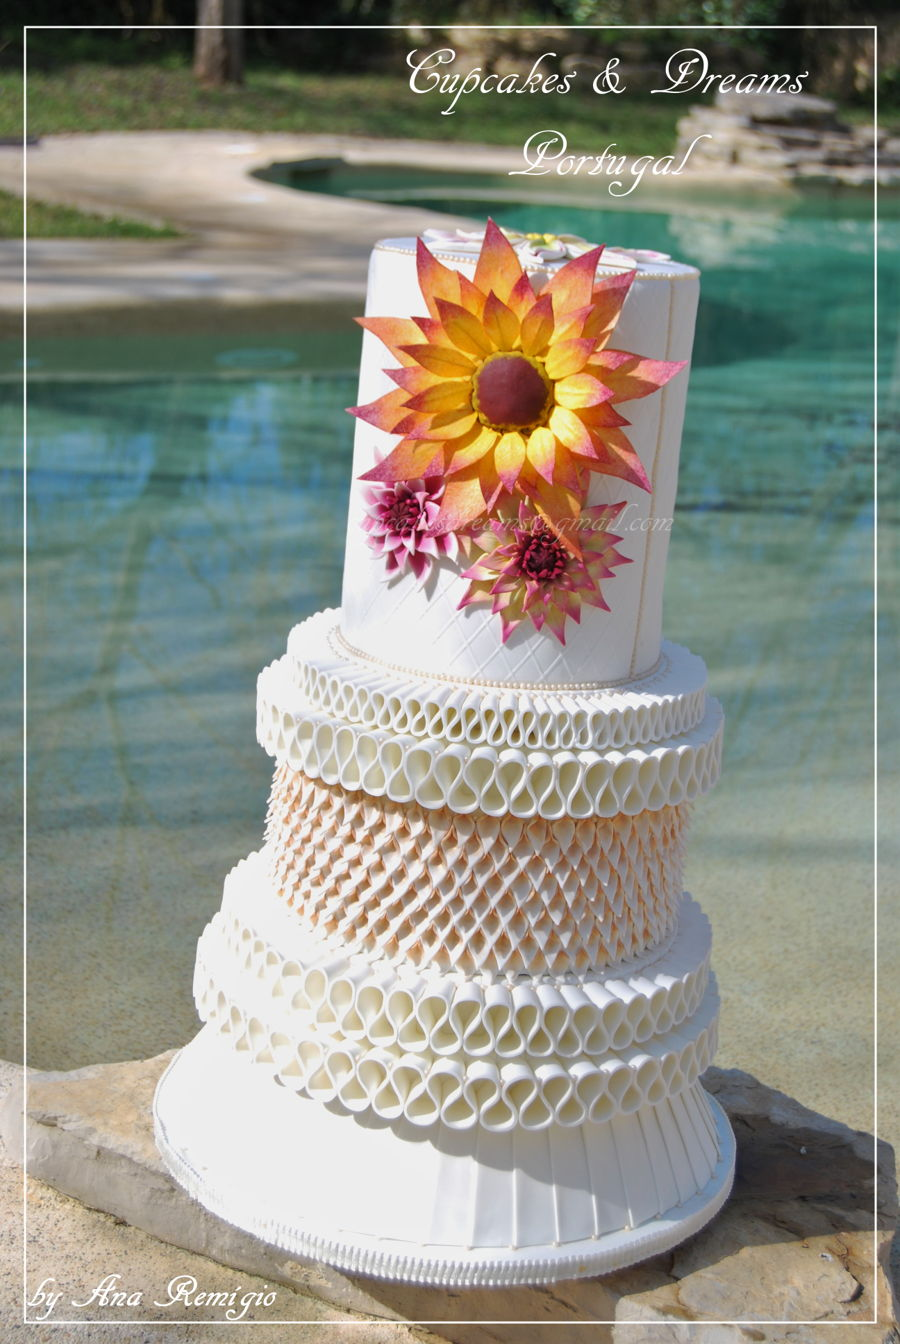 Dublin wedding cake irish sugarcraft show competition 2016 my classic wedding cake class 19 wedding cake classic open junglespirit Image collections